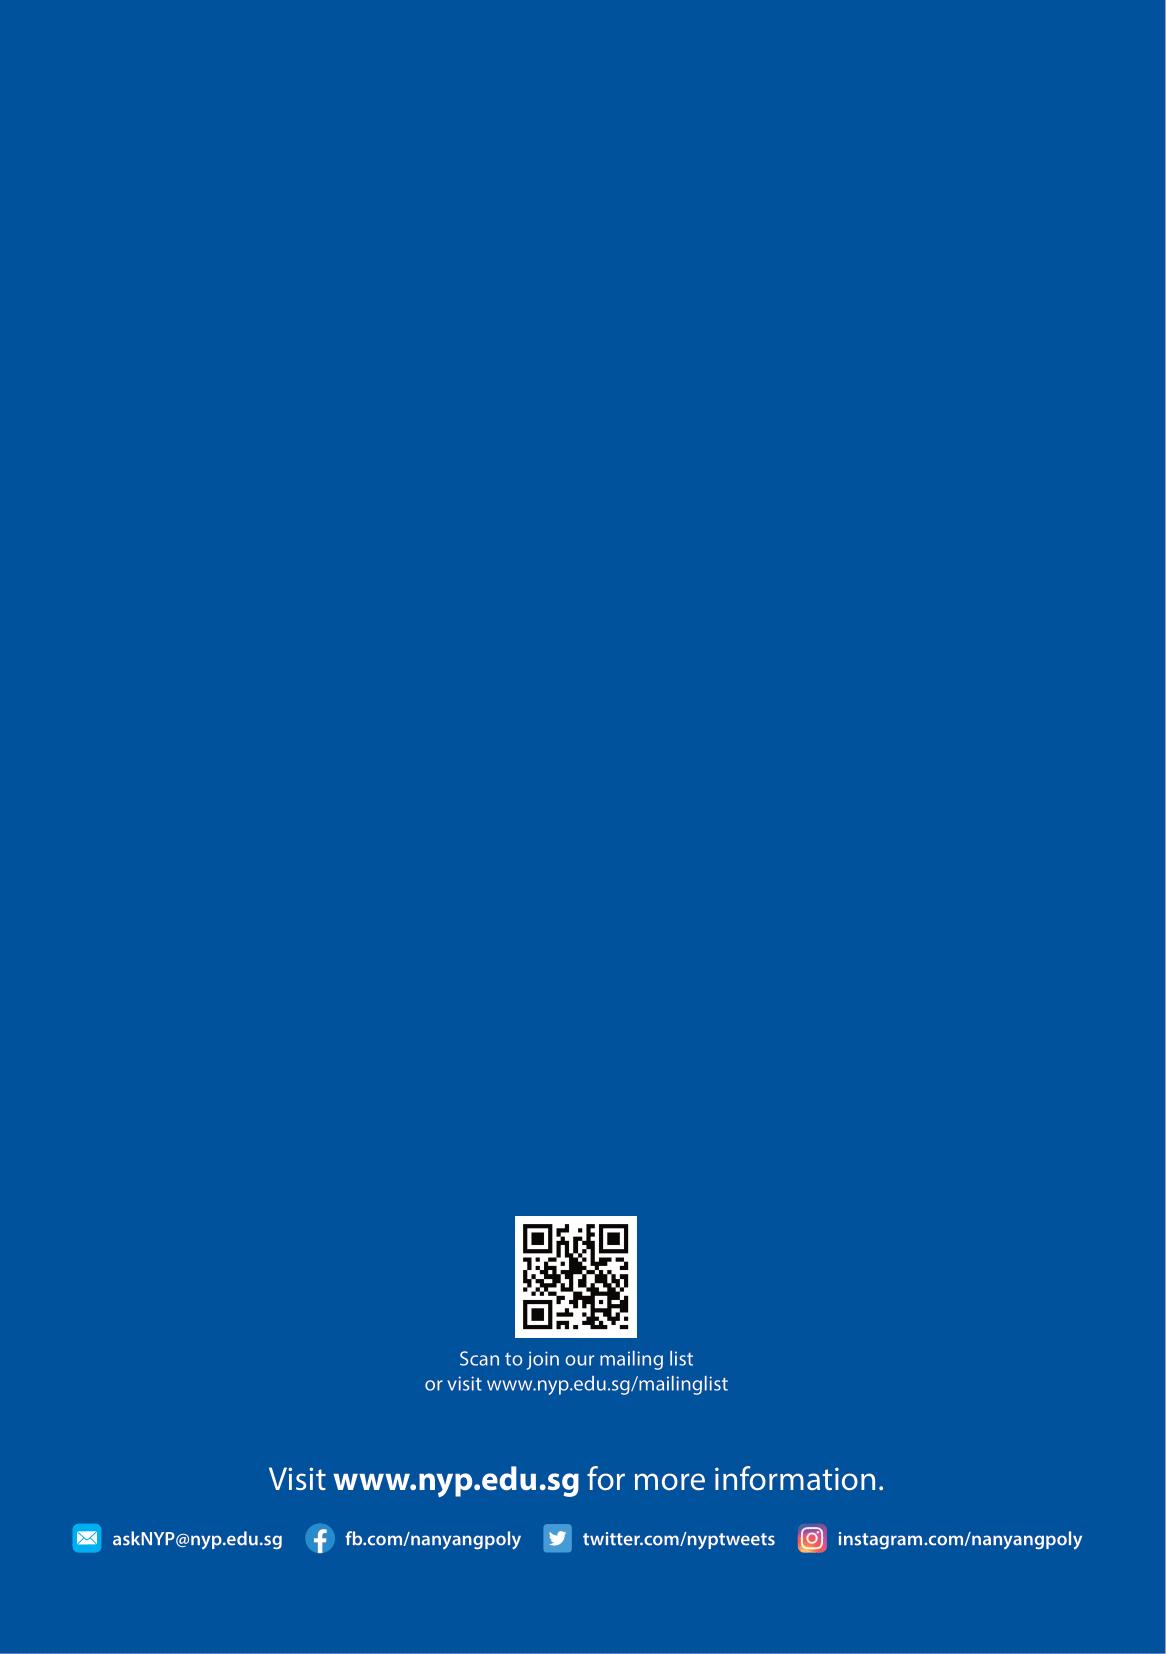 School of Information Technology 2020-19